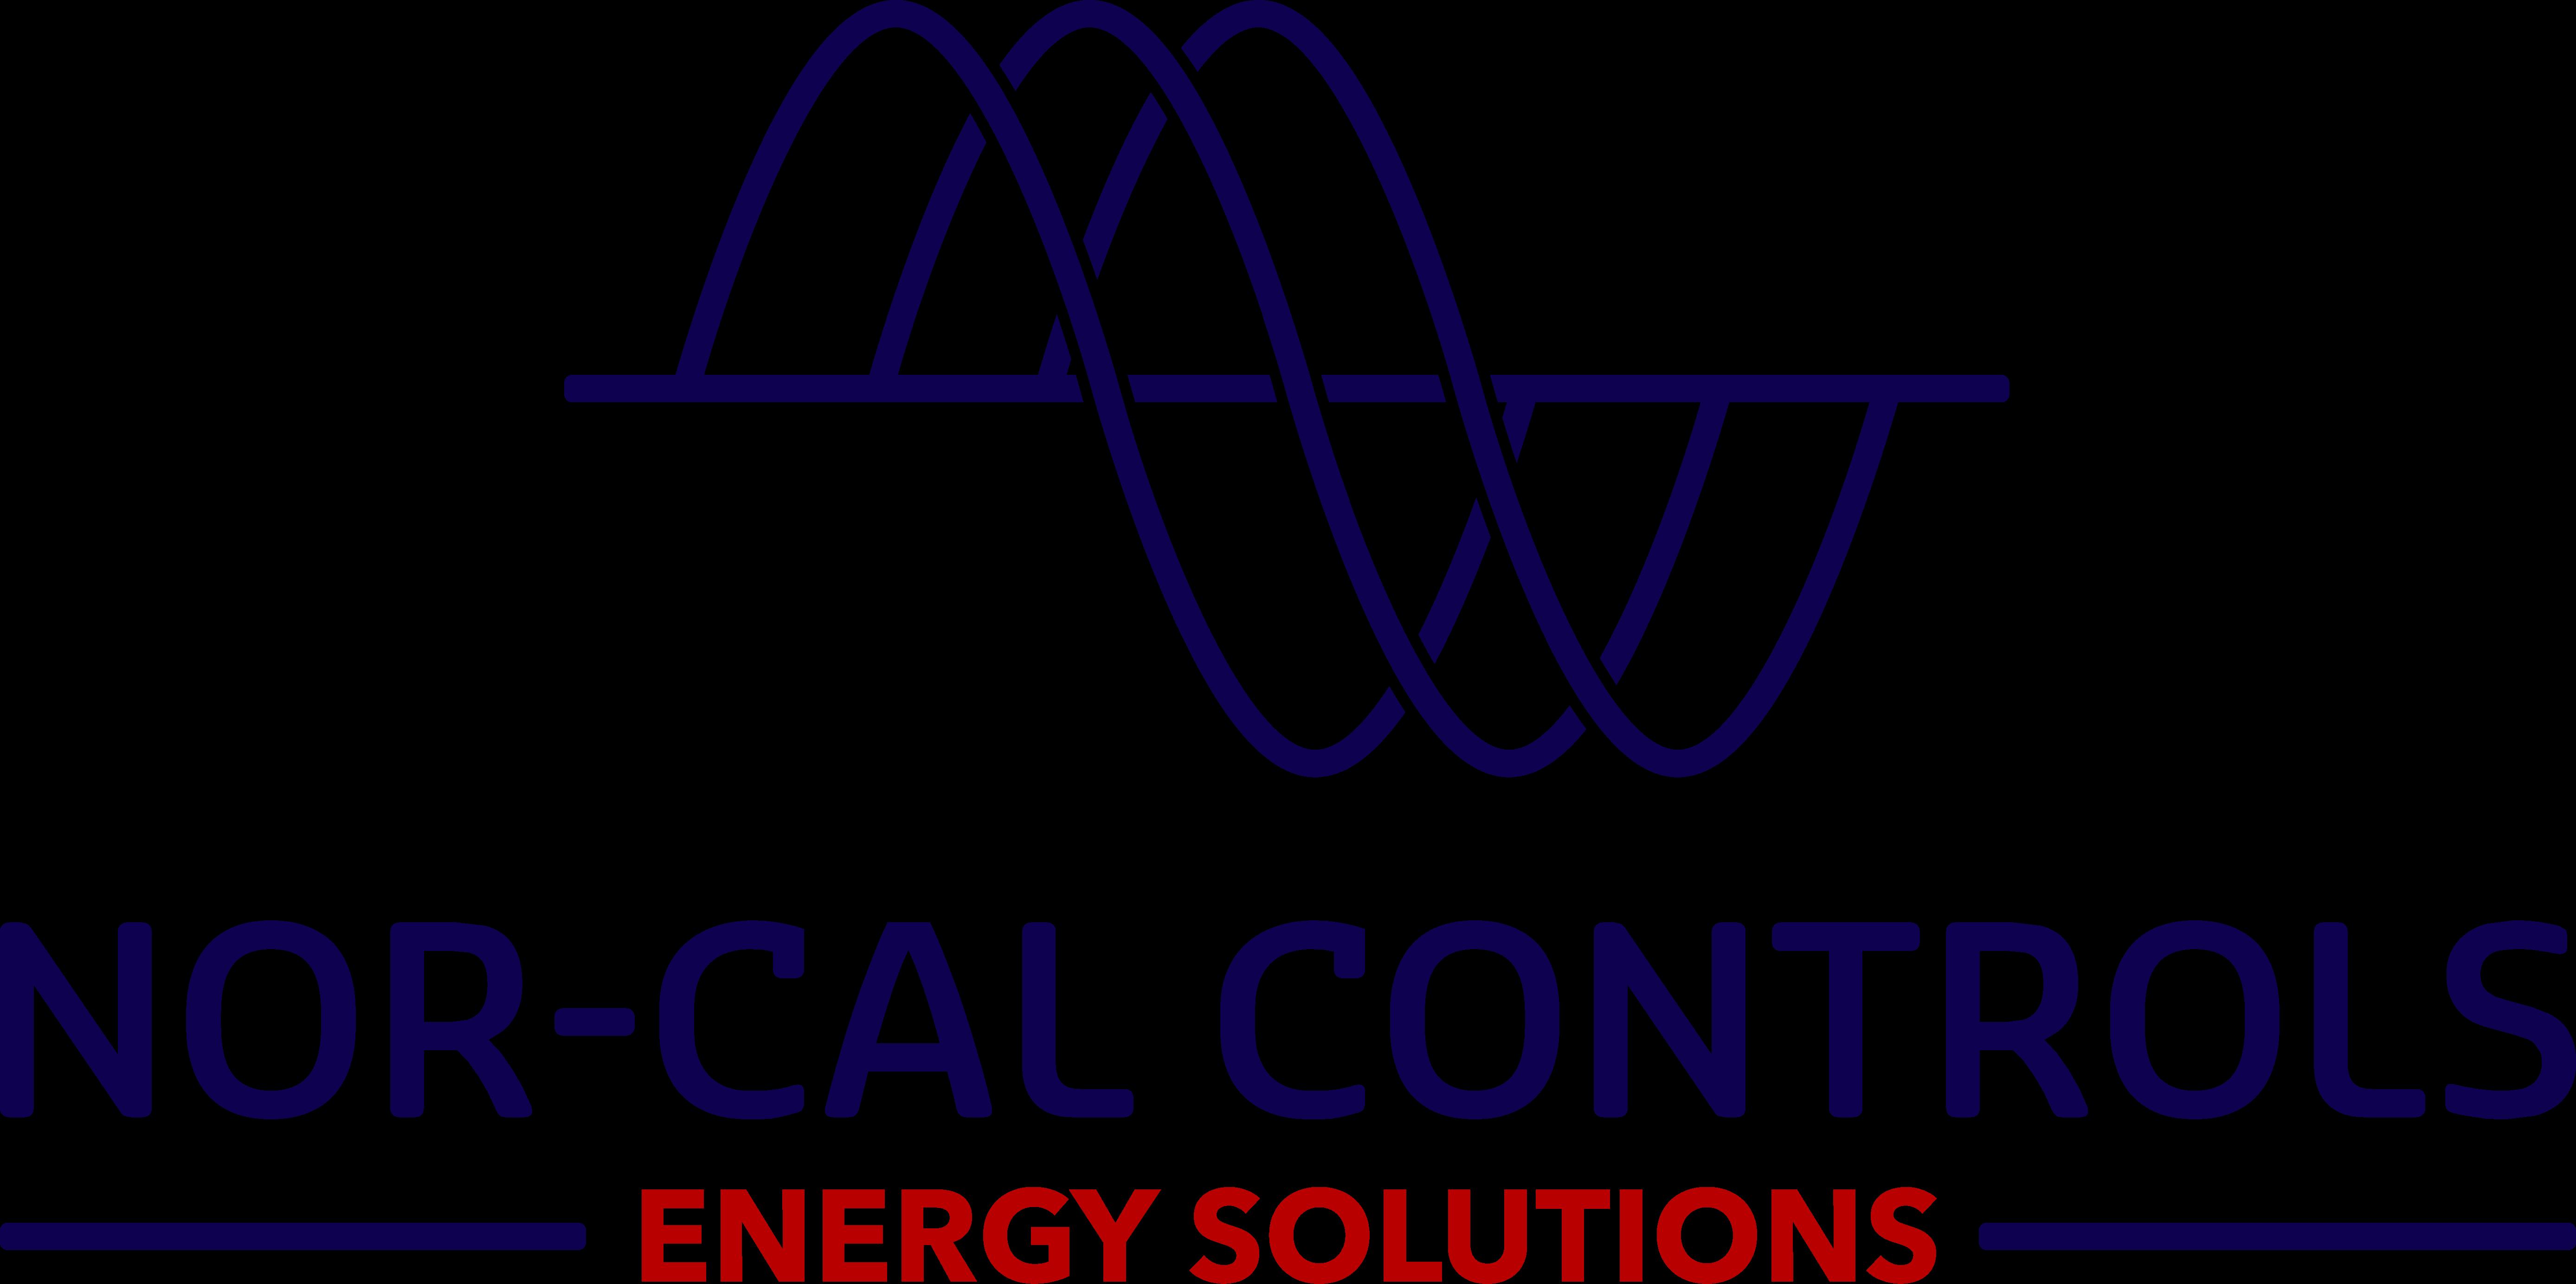 Nor-Cal_Controls-logo-Combination_Mark-RGB